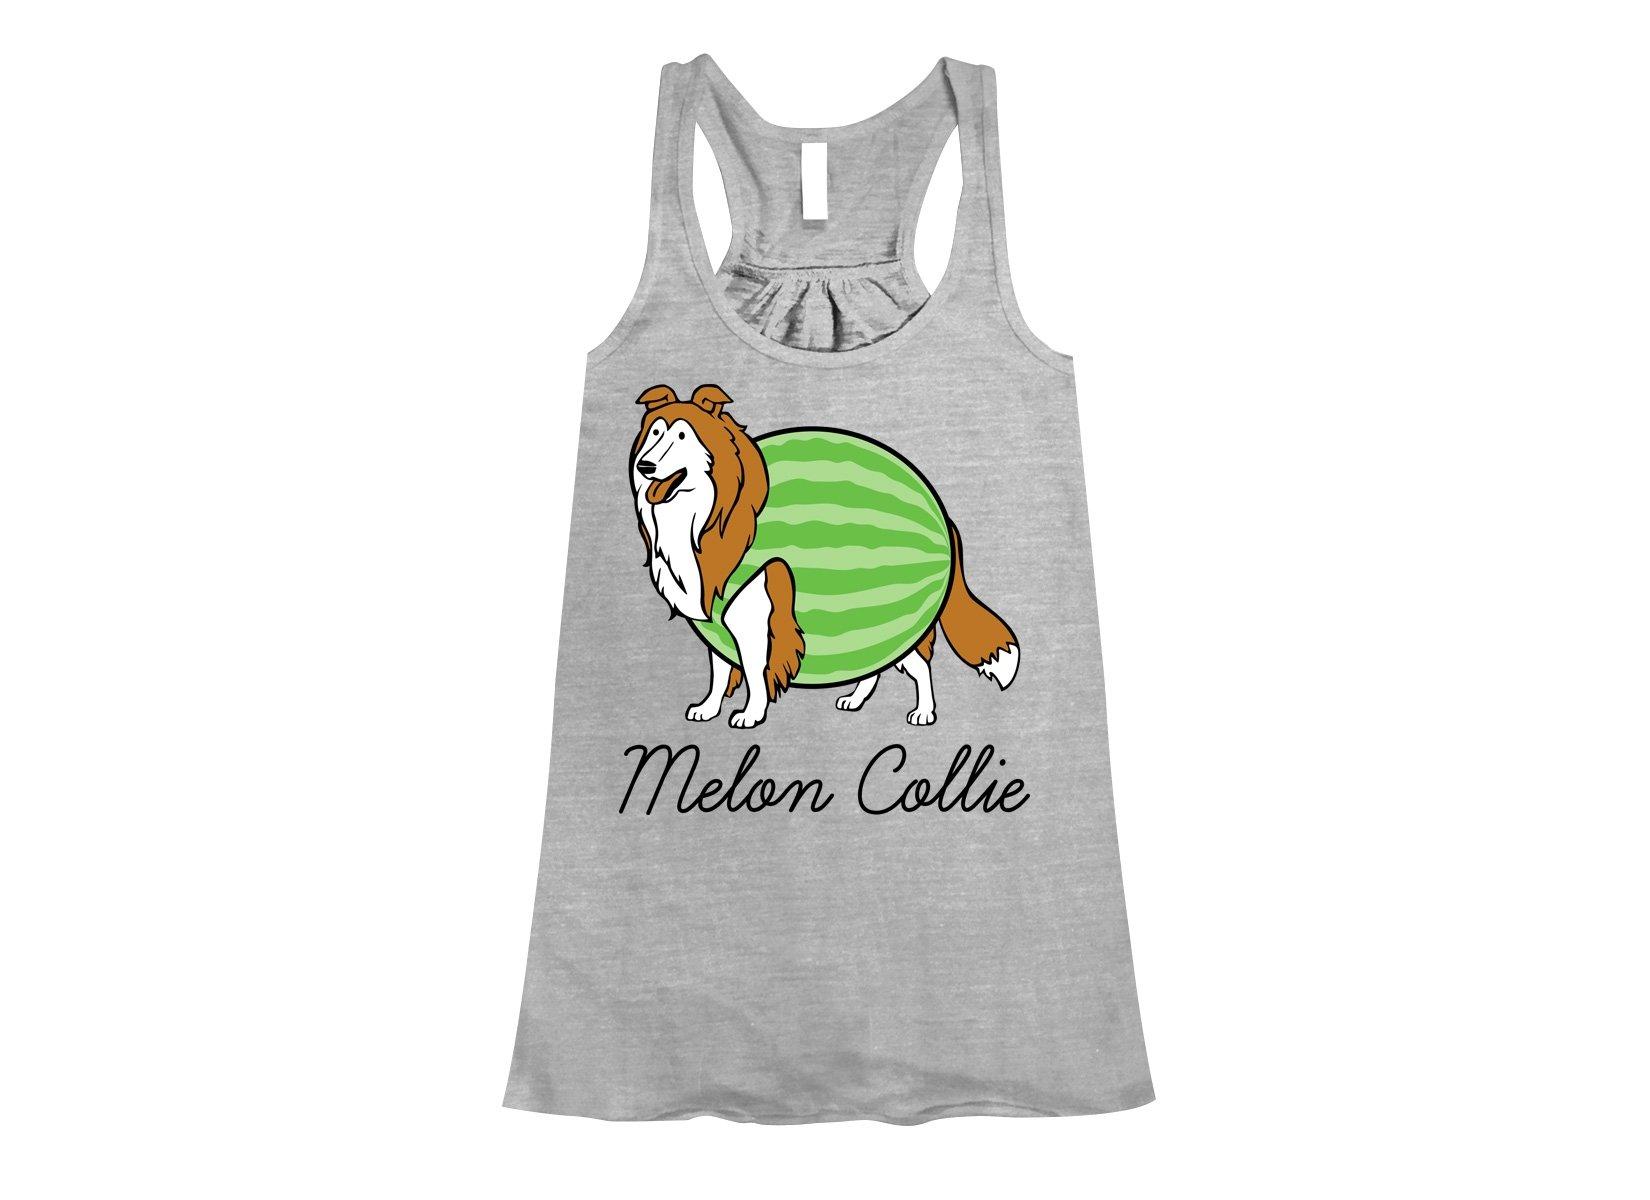 Melon Collie on Womens Tanks T-Shirt